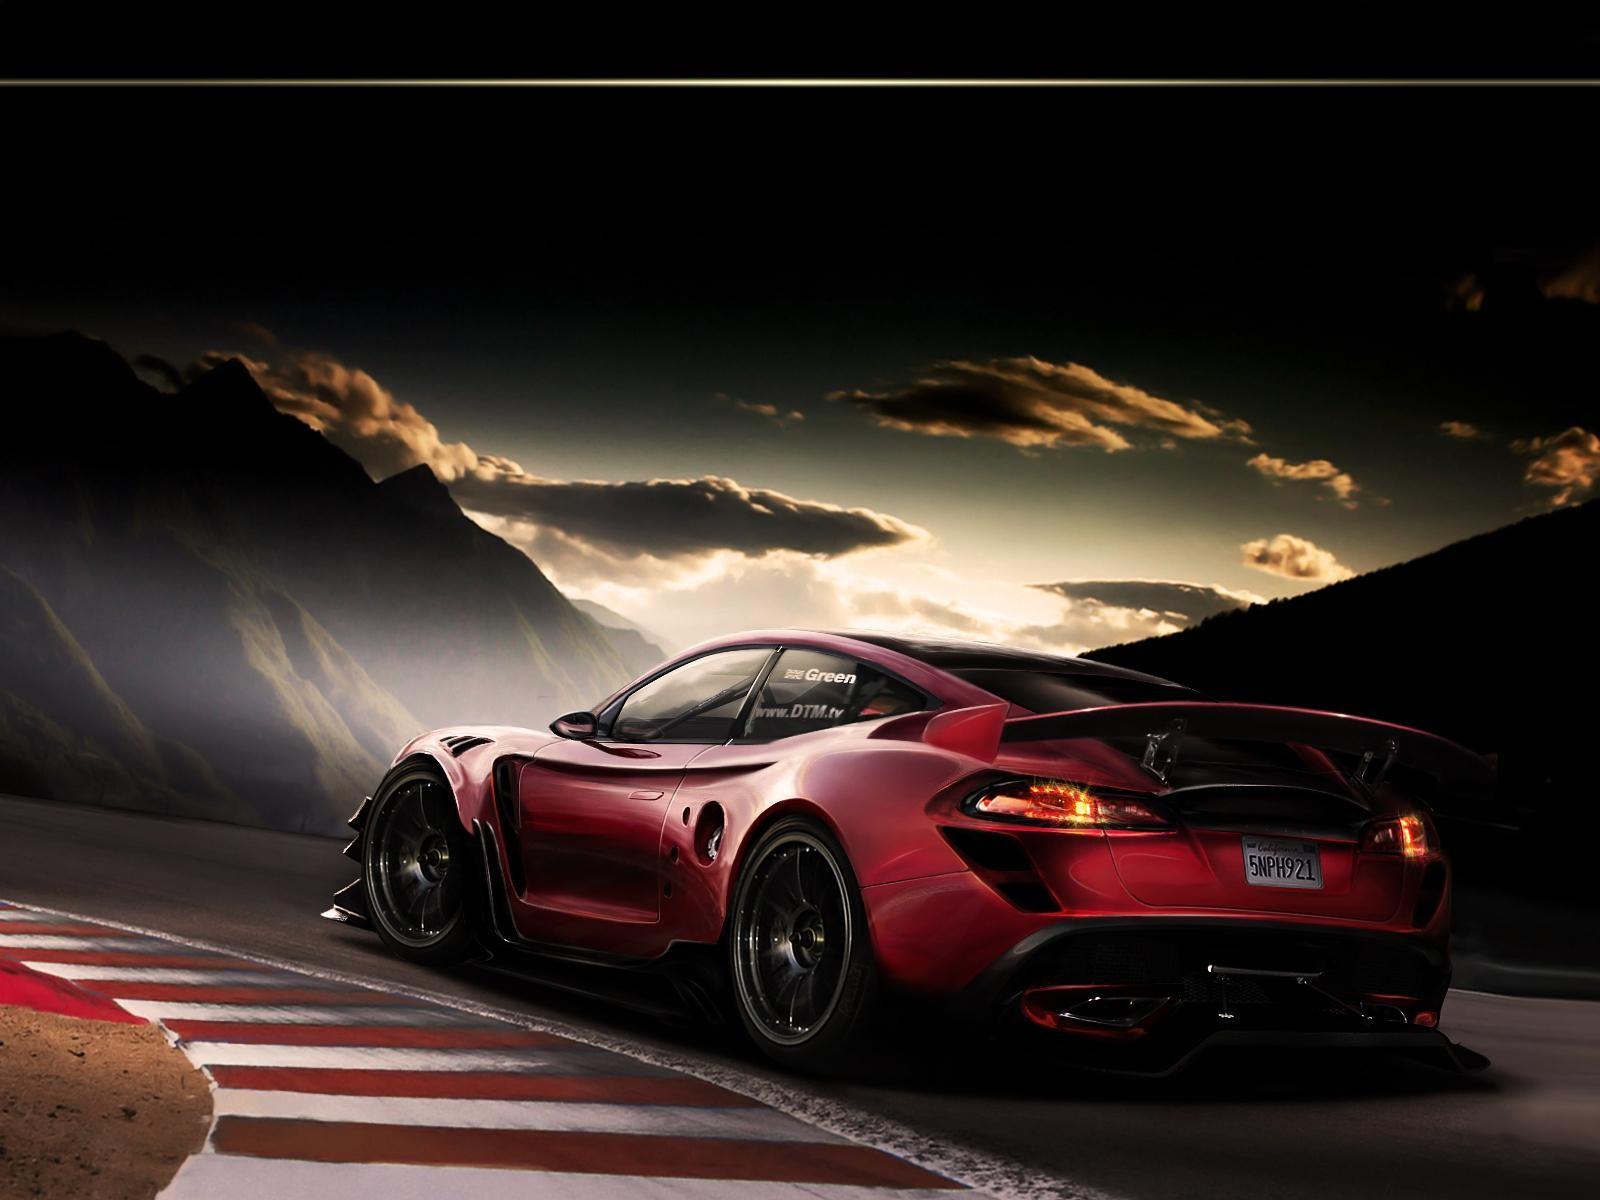 Awesome Cars Wallpaper Hd Wallpapersafari